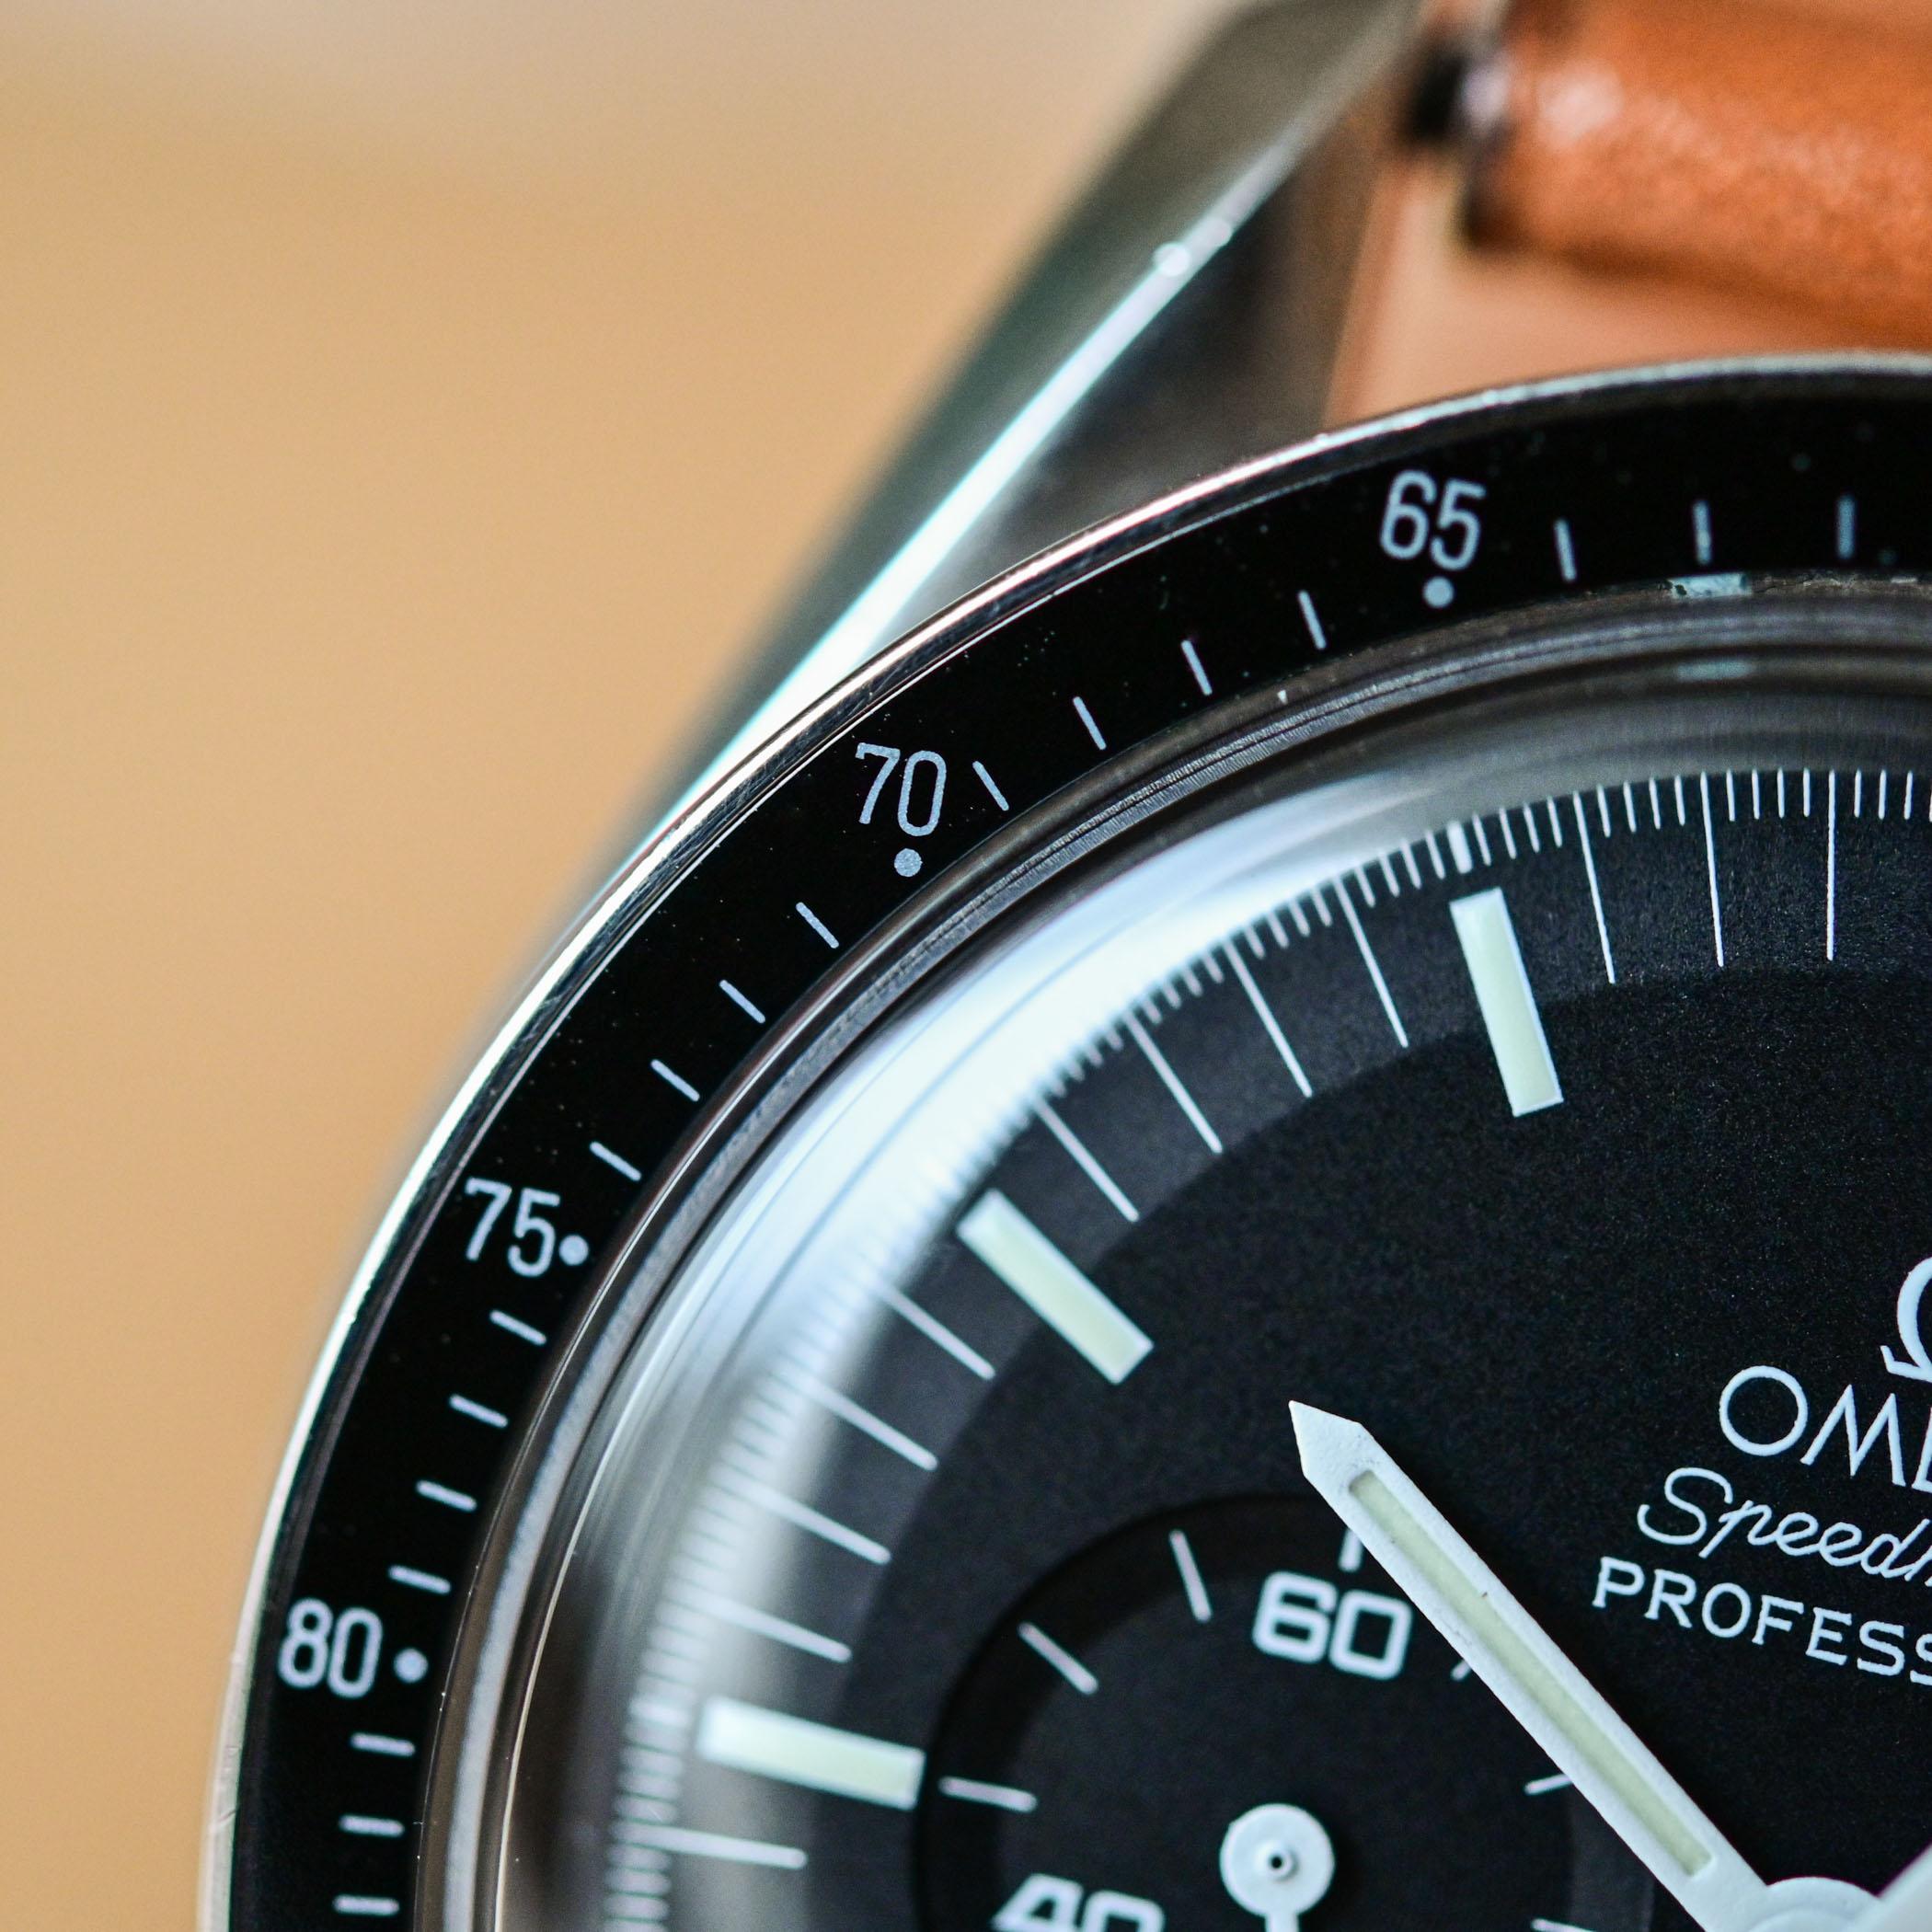 Omega Speedmaster Moonwatch Professional - pre-2021 Calibre 1861 steel on steel hesalite 311.30.42.30.01.005 - 6